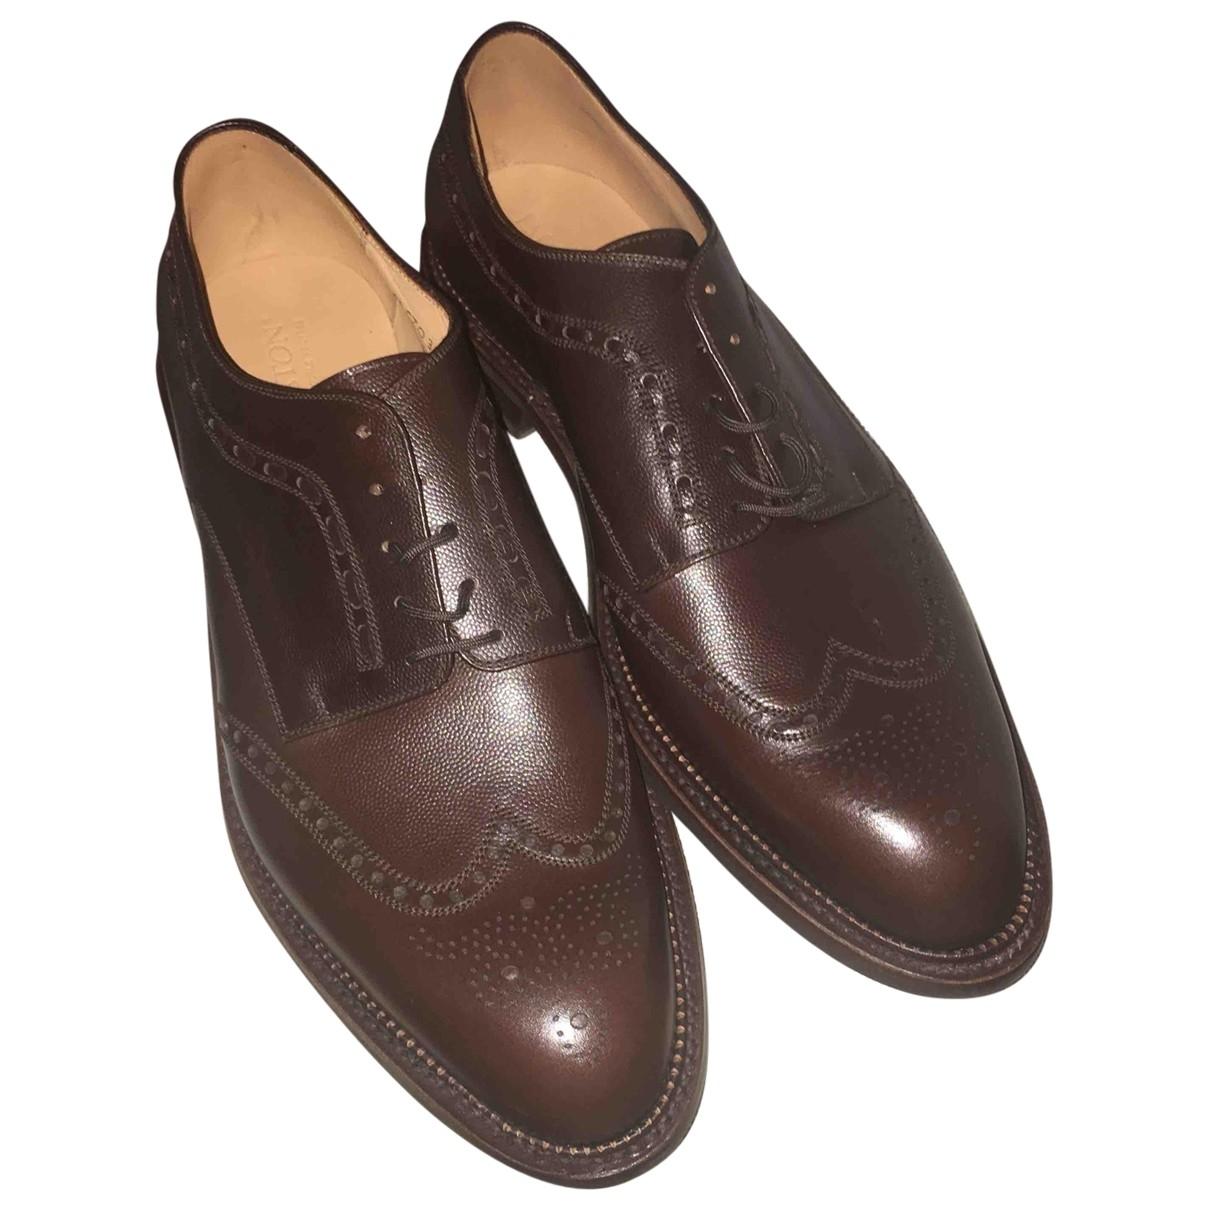 Jm Weston \N Brown Leather Lace ups for Men 43 EU